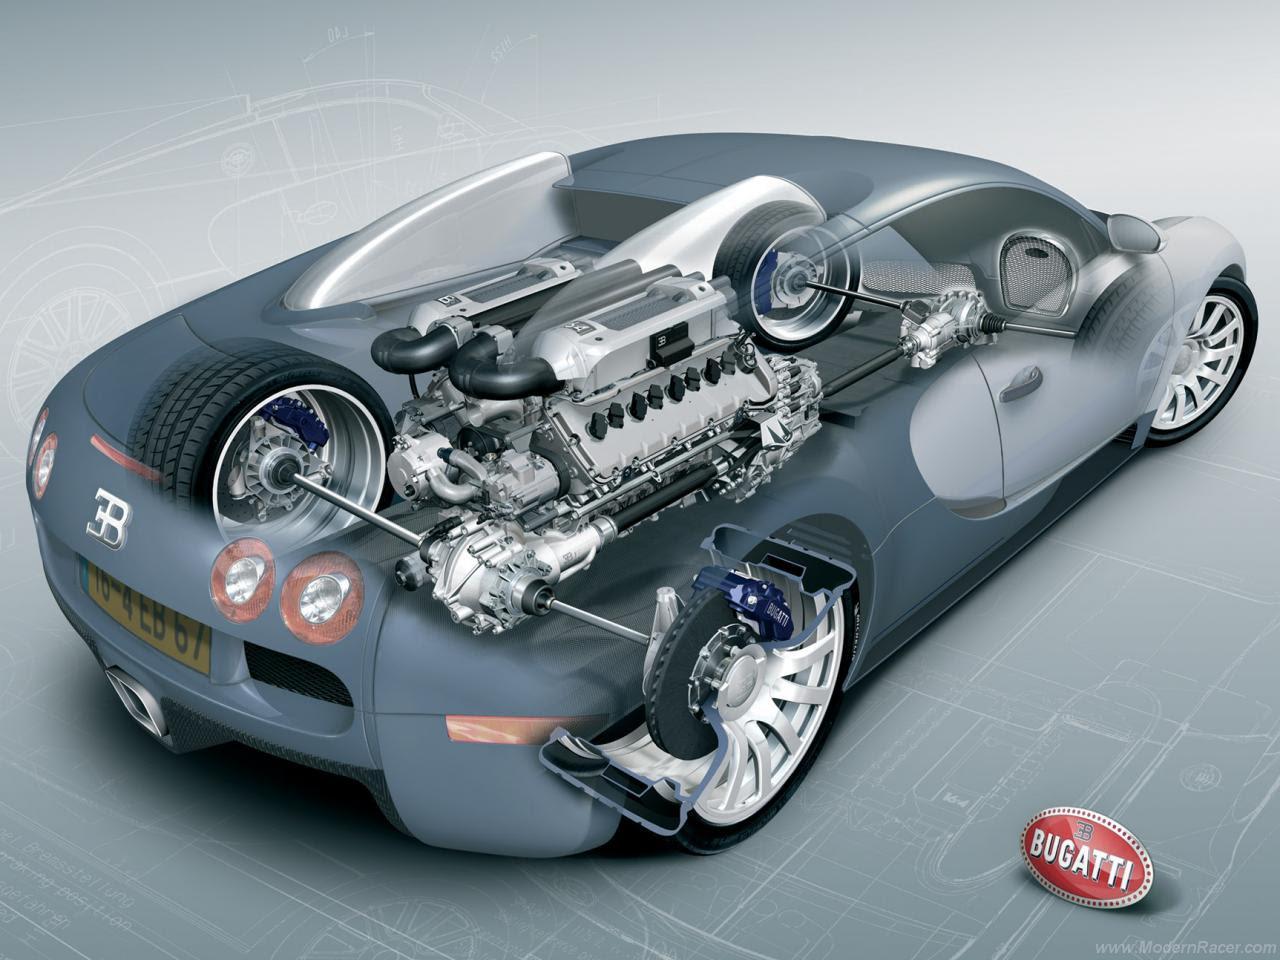 Bugatti Veyron 16 4 Car Cutaway Modern Racer Features